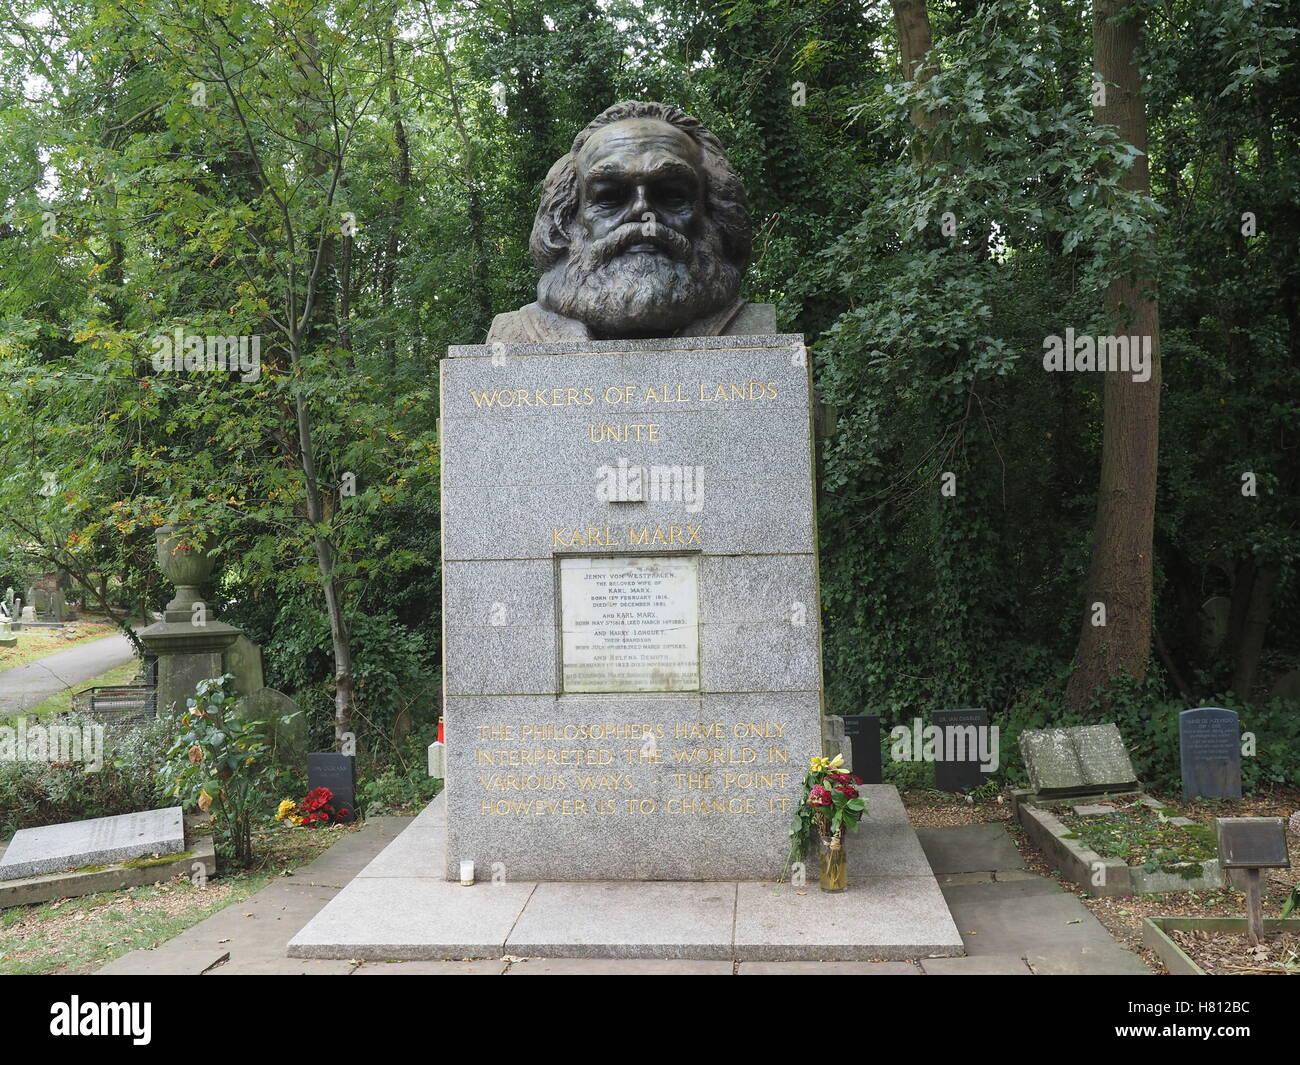 Highgate Cemetery London, Karl Marx - Stock Image